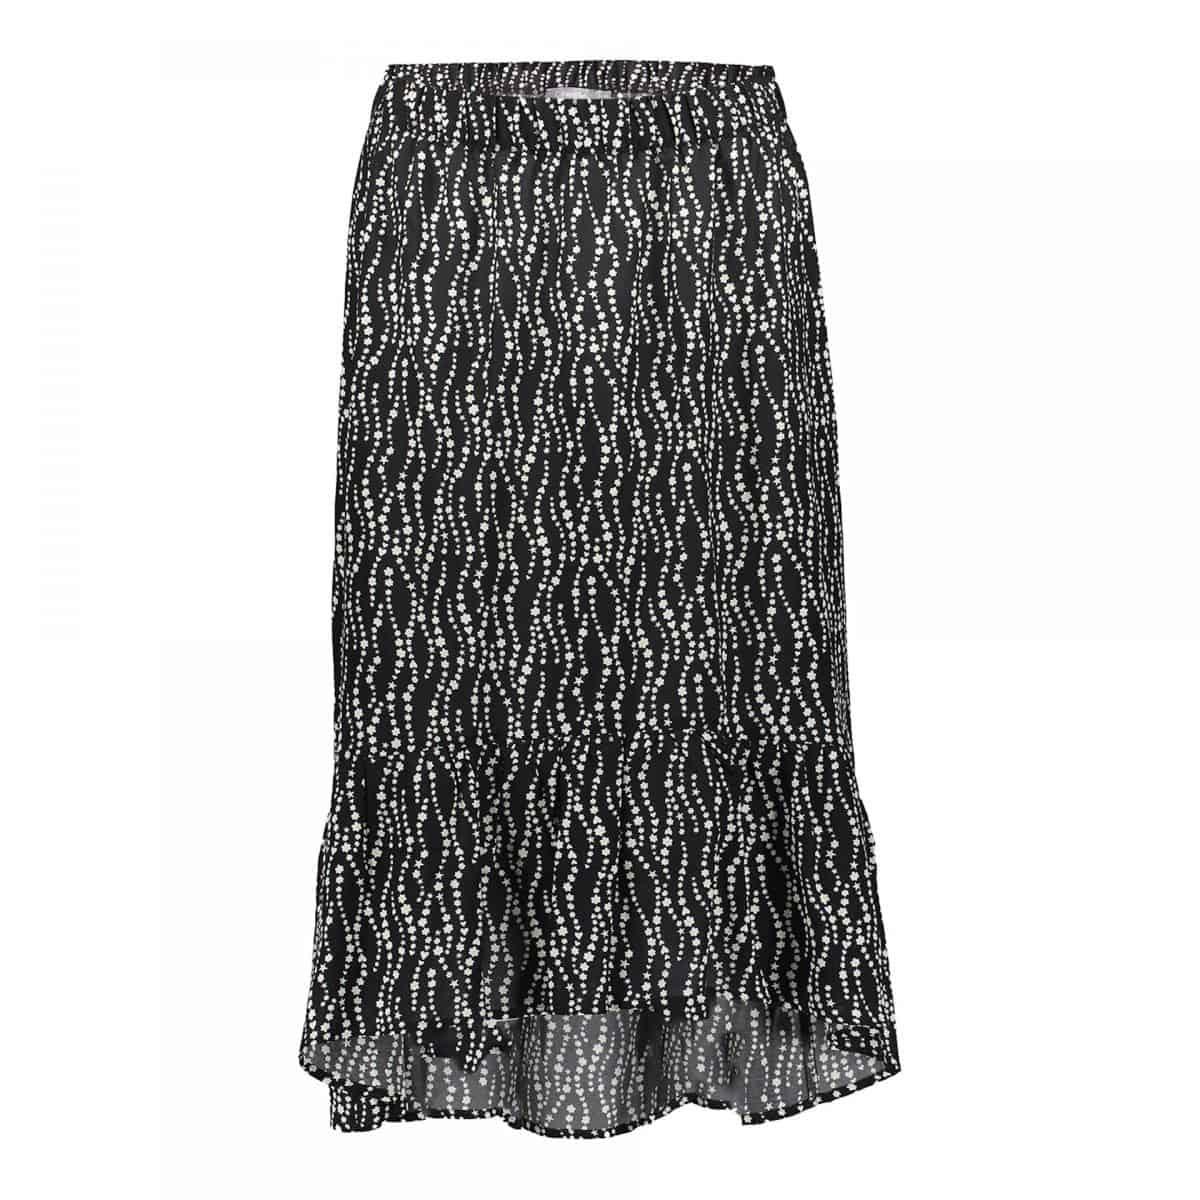 Geisha Skirt Black/Off-White Combi